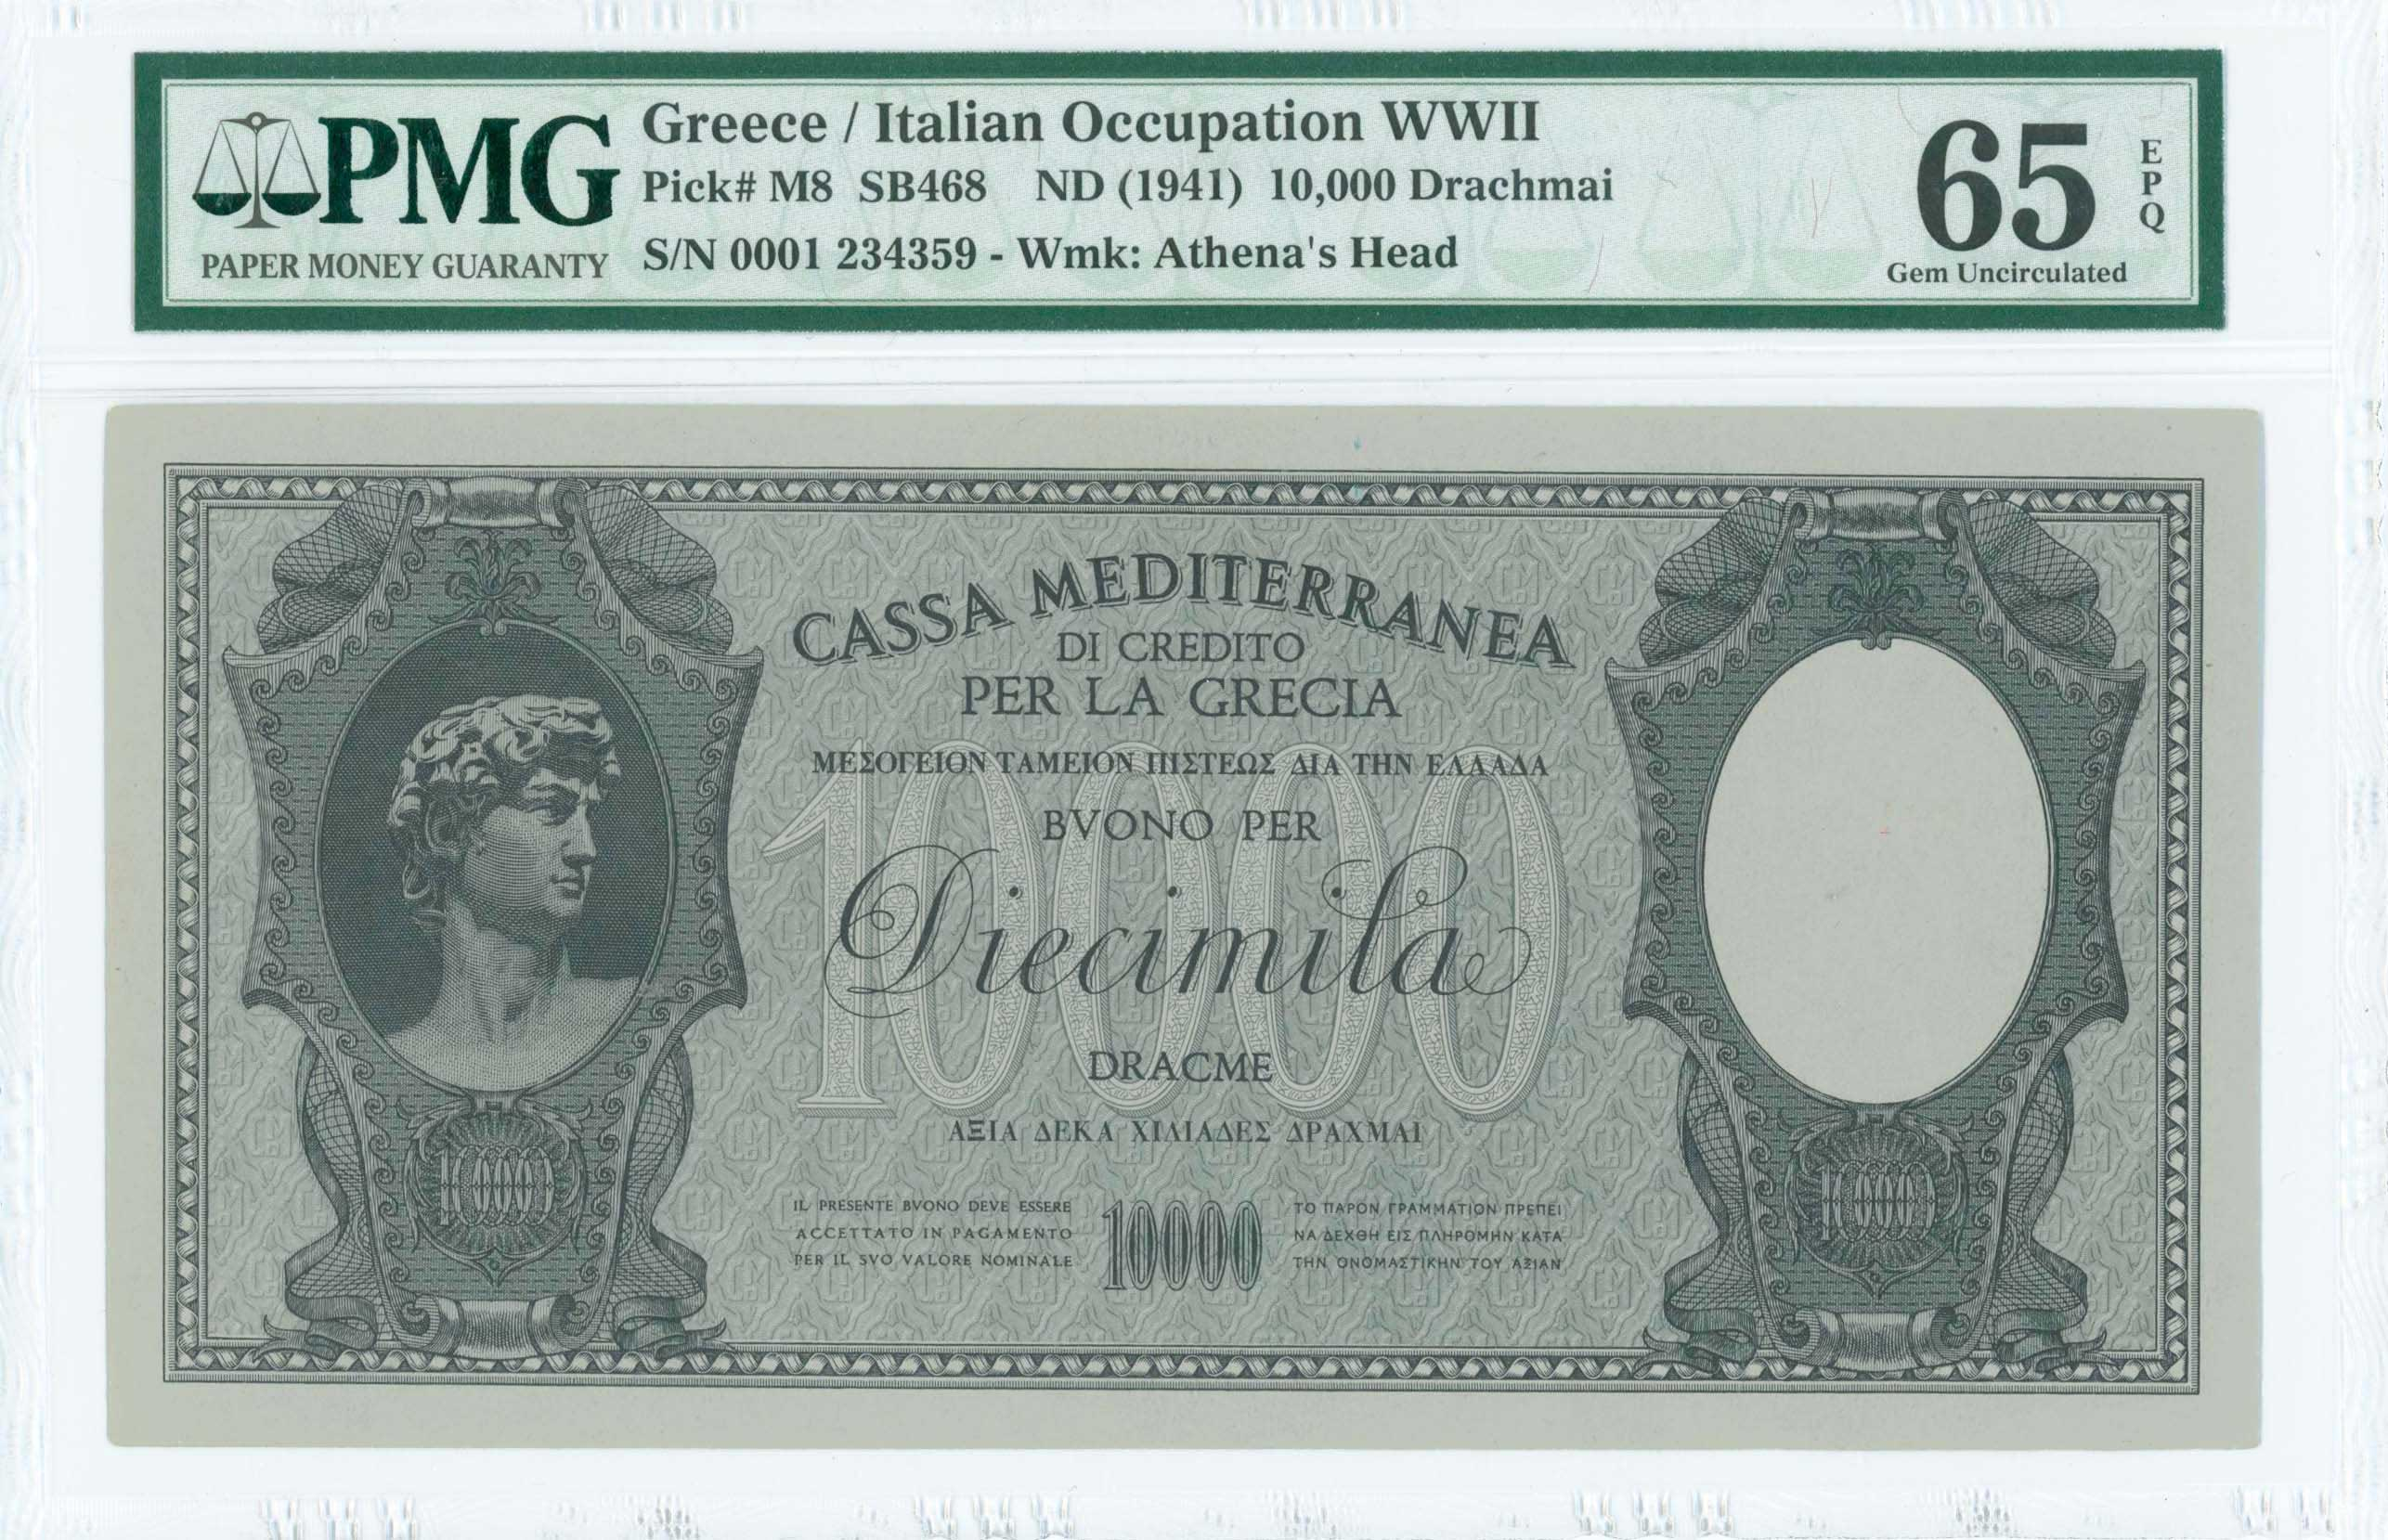 Lot 6740 - -  PAPER MONEY - BANKNOTES italian occupation -  A. Karamitsos Public & Live Internet Auction 671 (Part A)